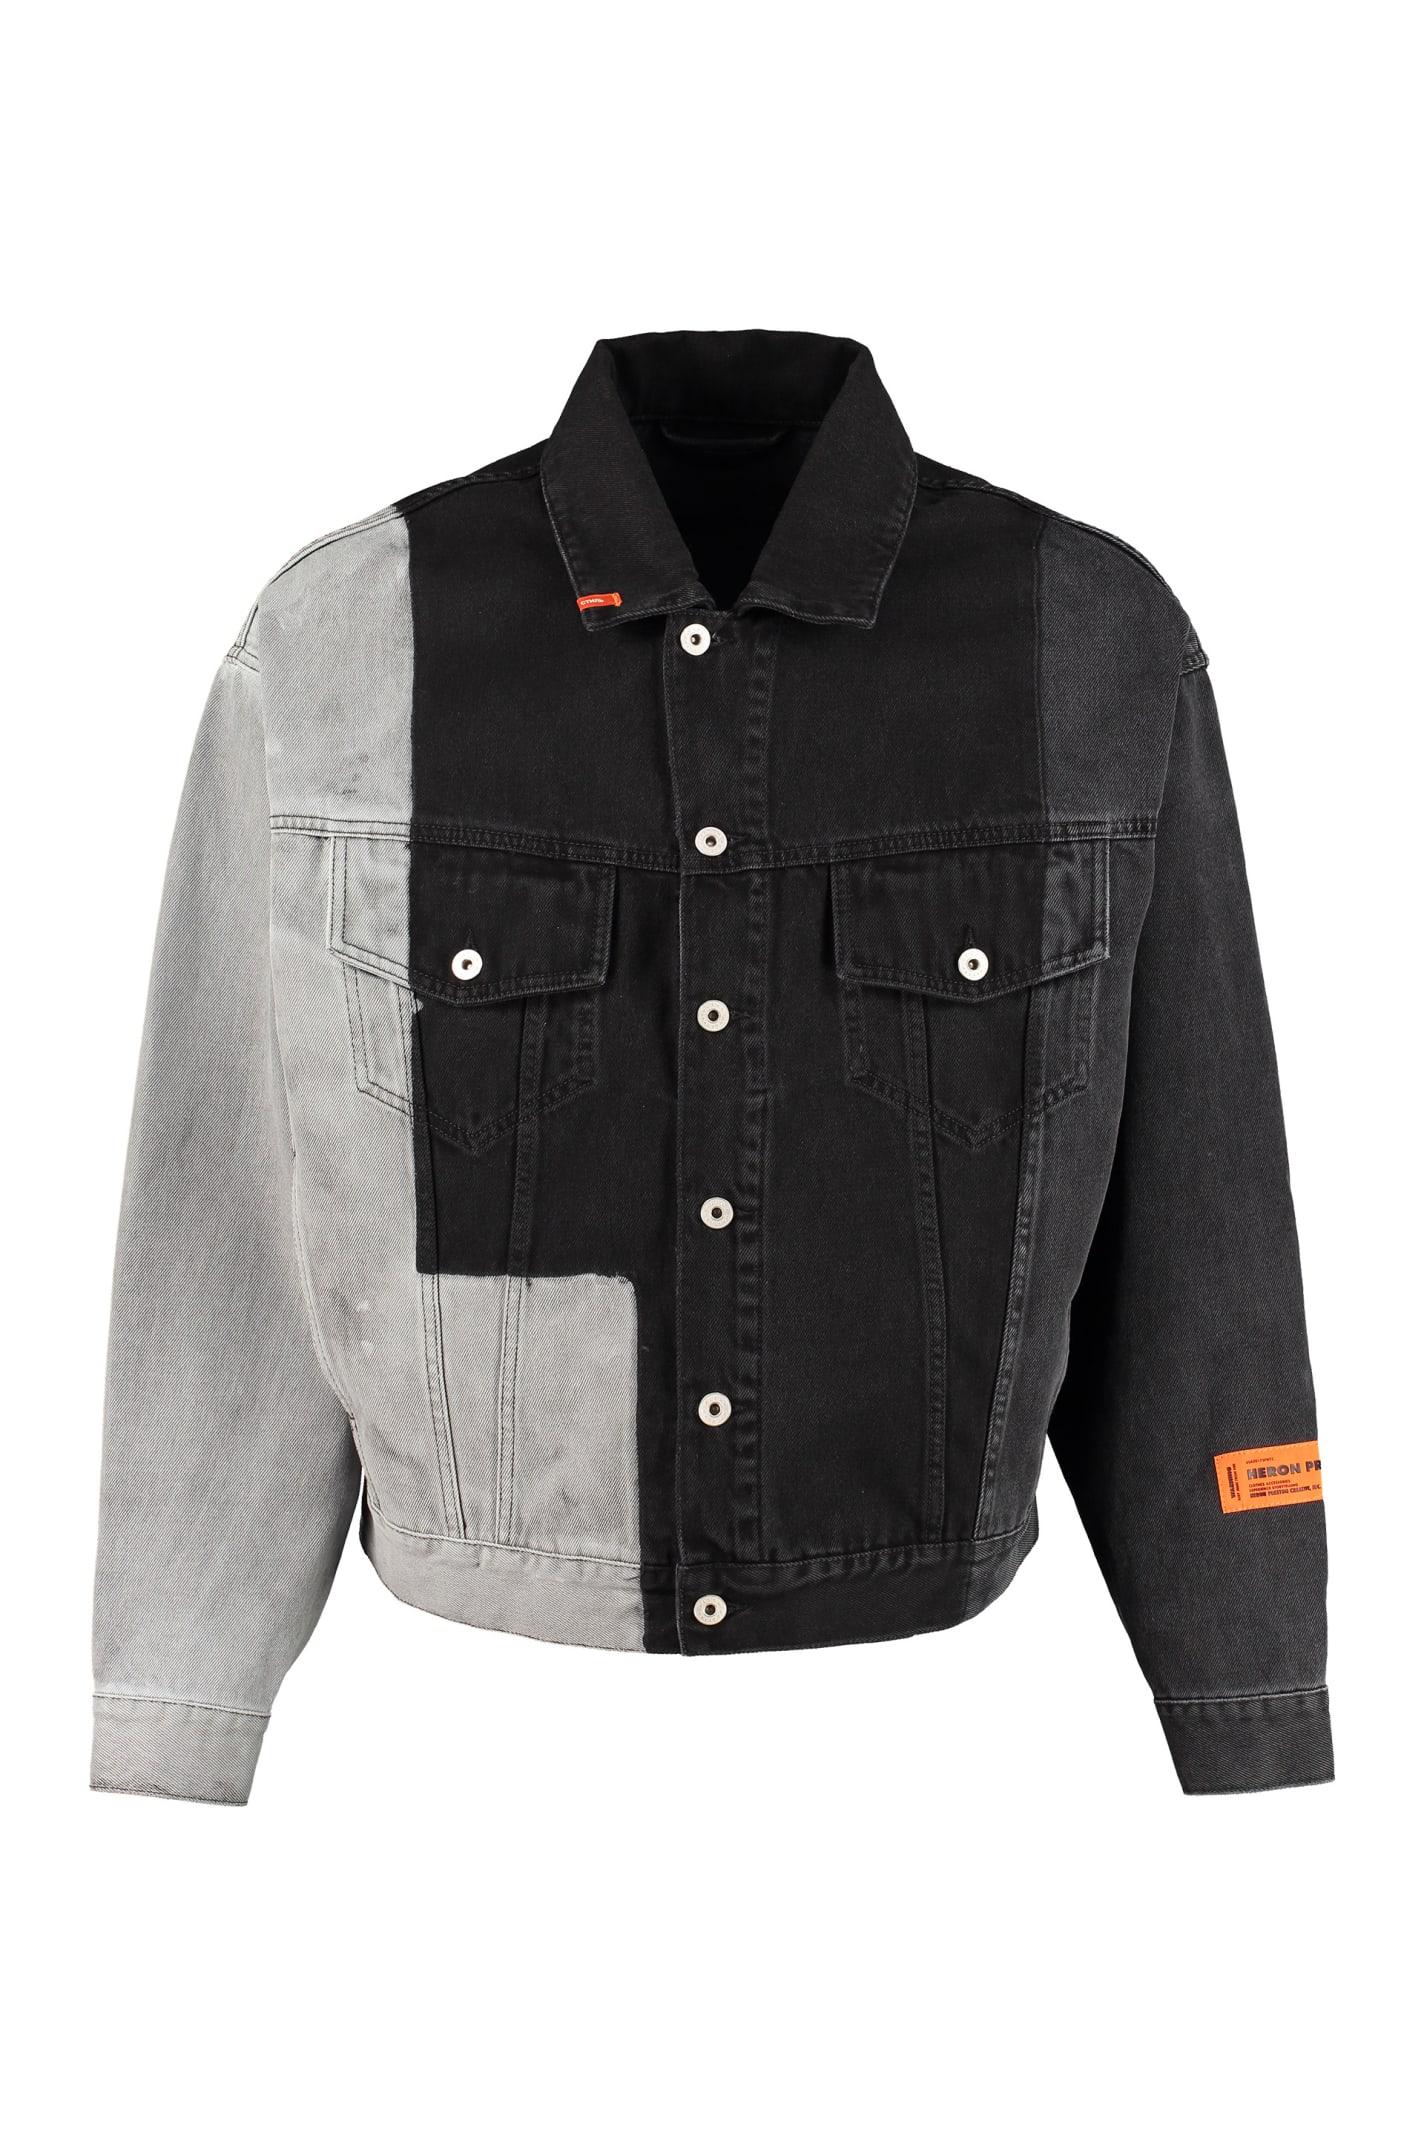 HERON PRESTON Denim Jacket